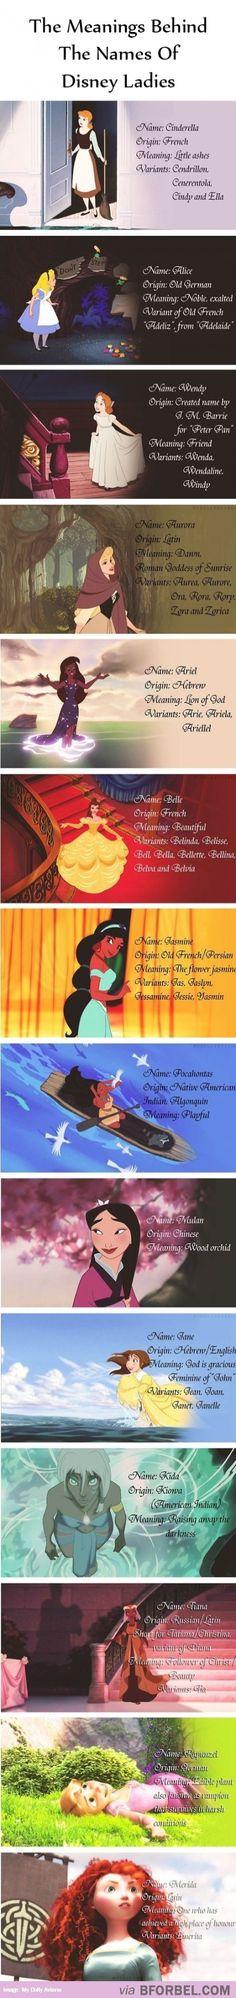 "Meta: ""The Meanings Behind The Names of Disney Ladies."" Posted on bforbel.com."